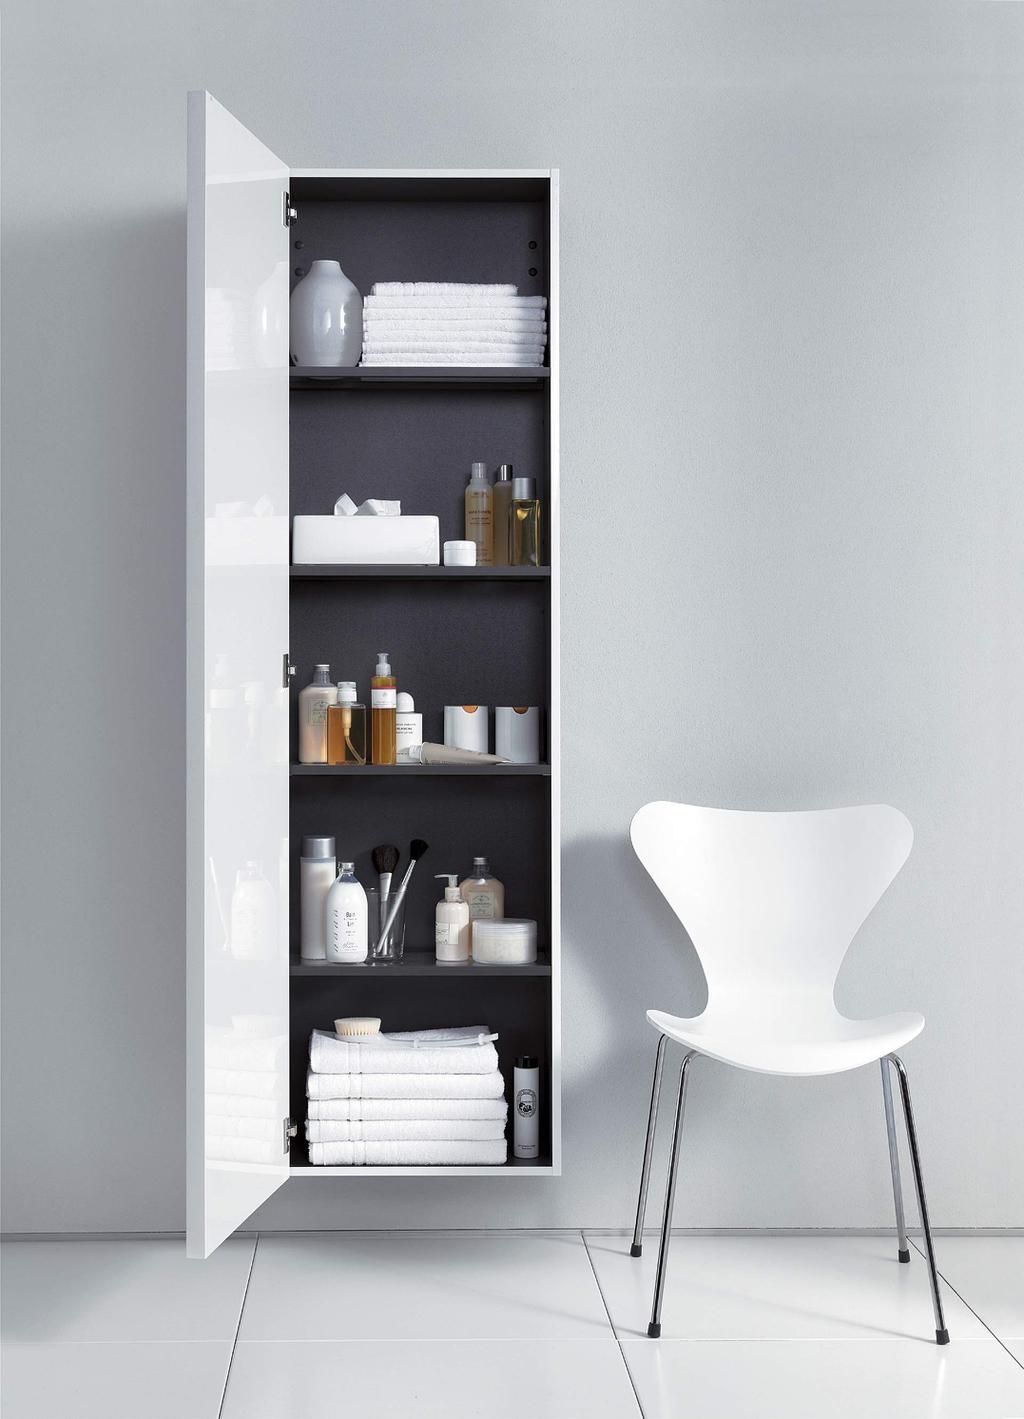 Duravit Delos: Bathroom furniture designed by EOOS   Duravit